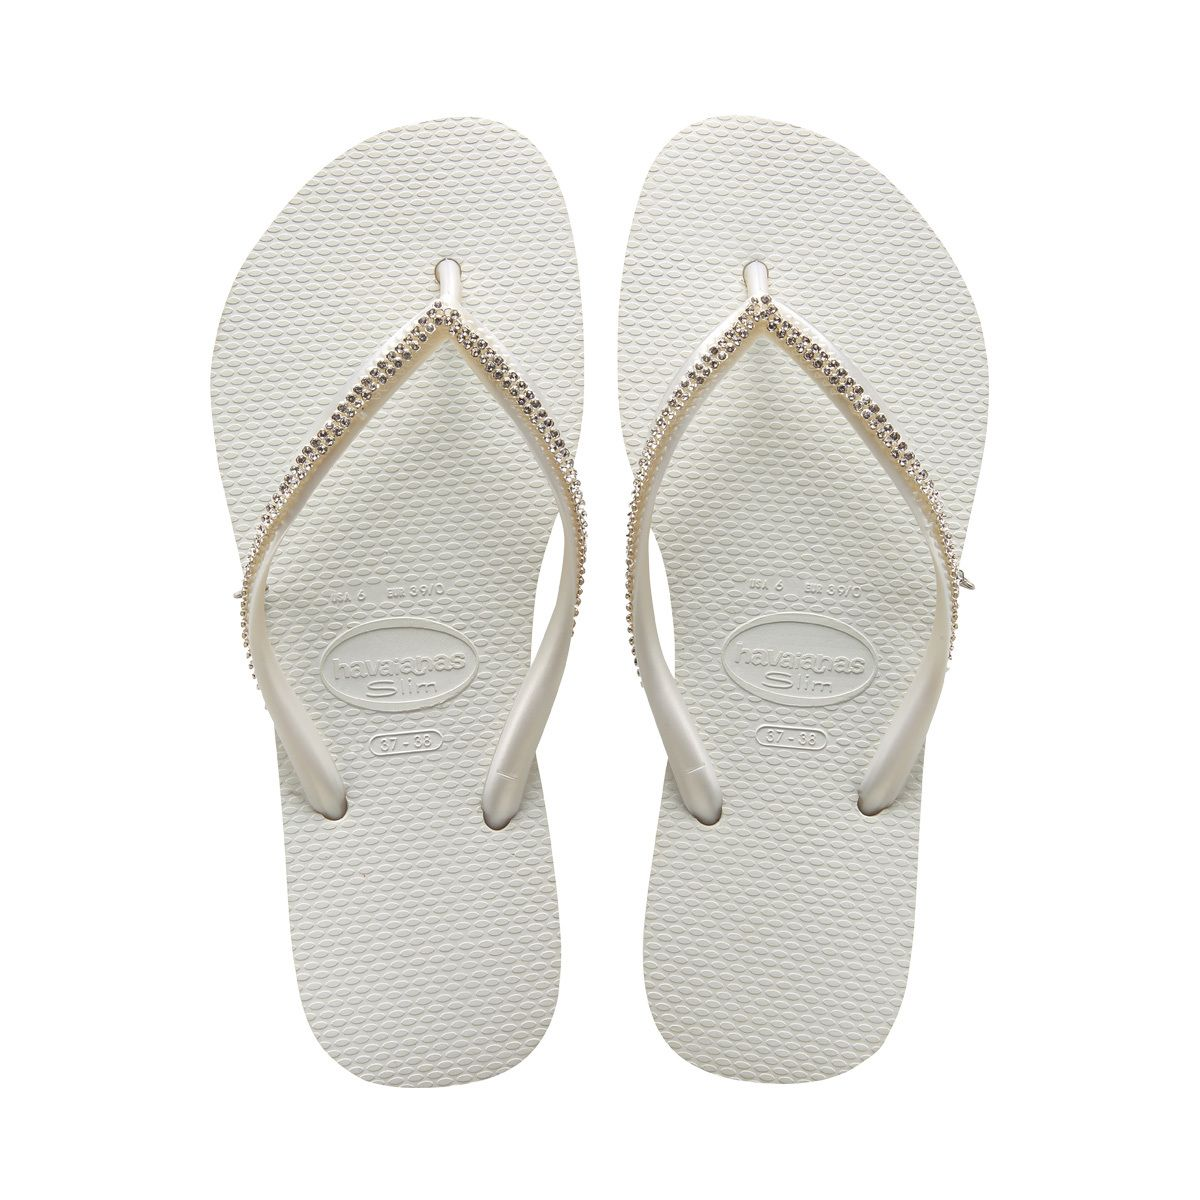 fd21fc17c 37 38 - Havaianas - Women - Slim Crystal Mesh Flip Flops